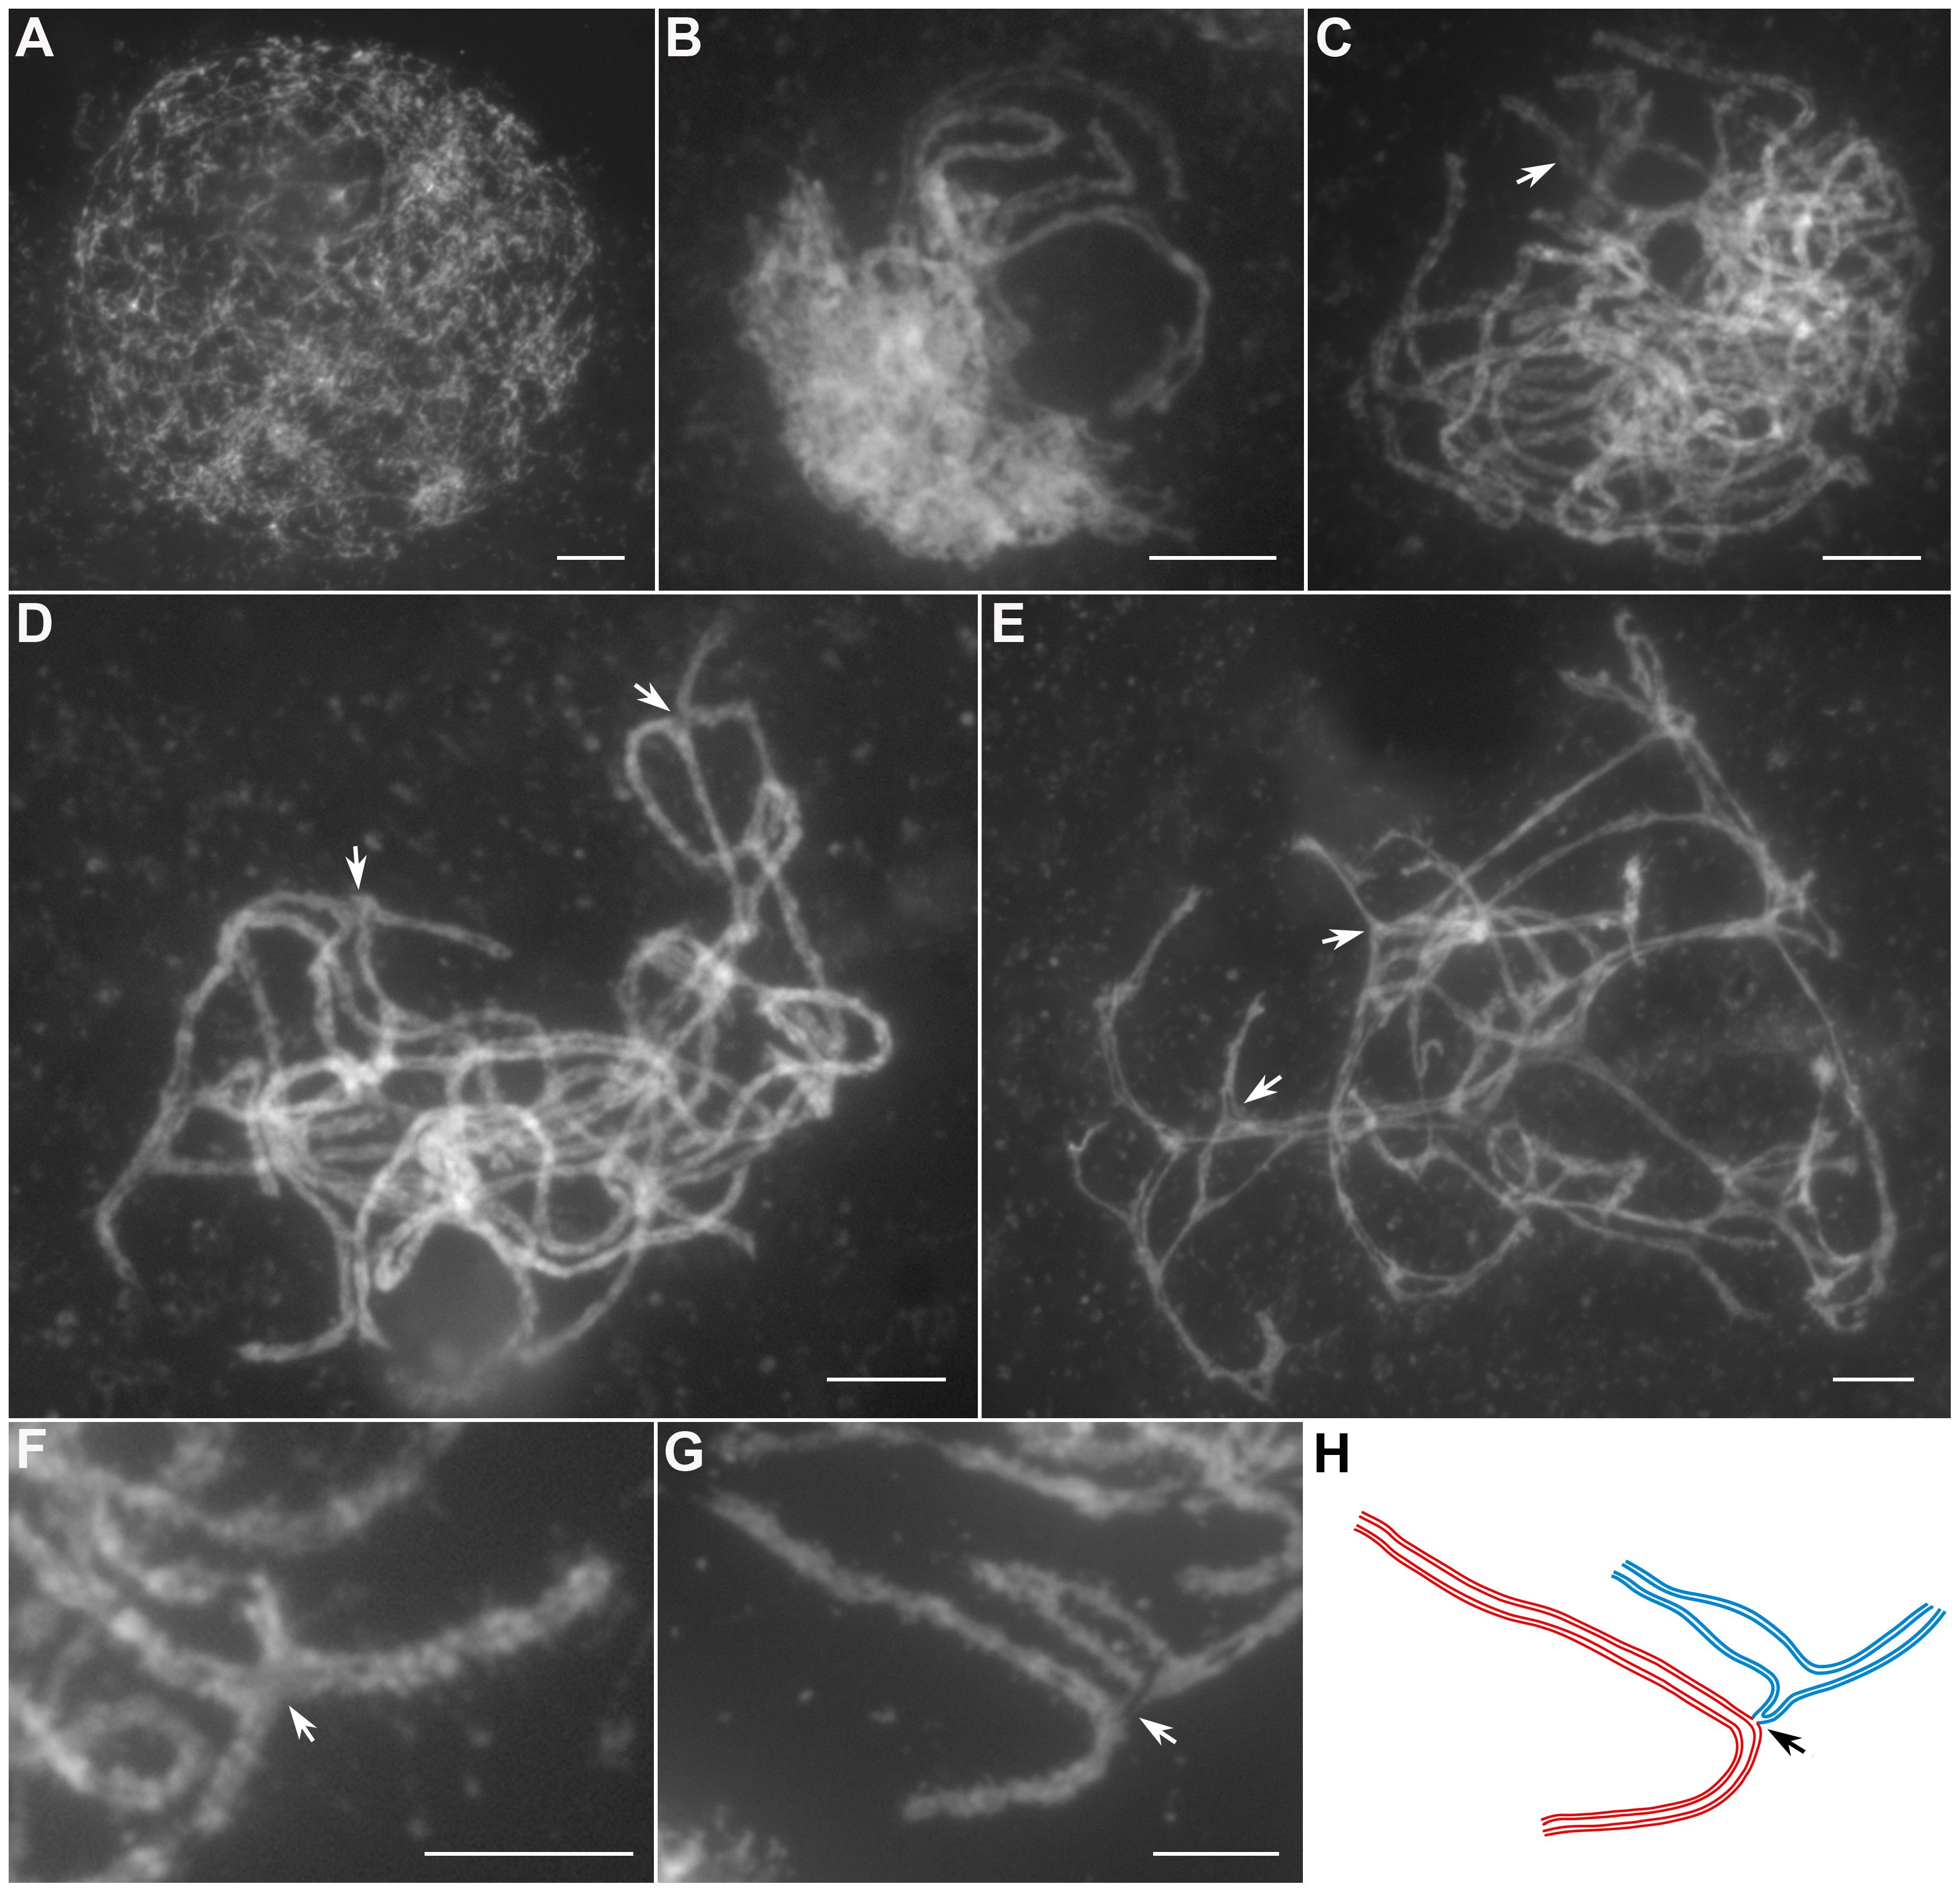 Meiotic chromosome behaviors of PMCs in the <i>Oshus1-1</i> mutant.